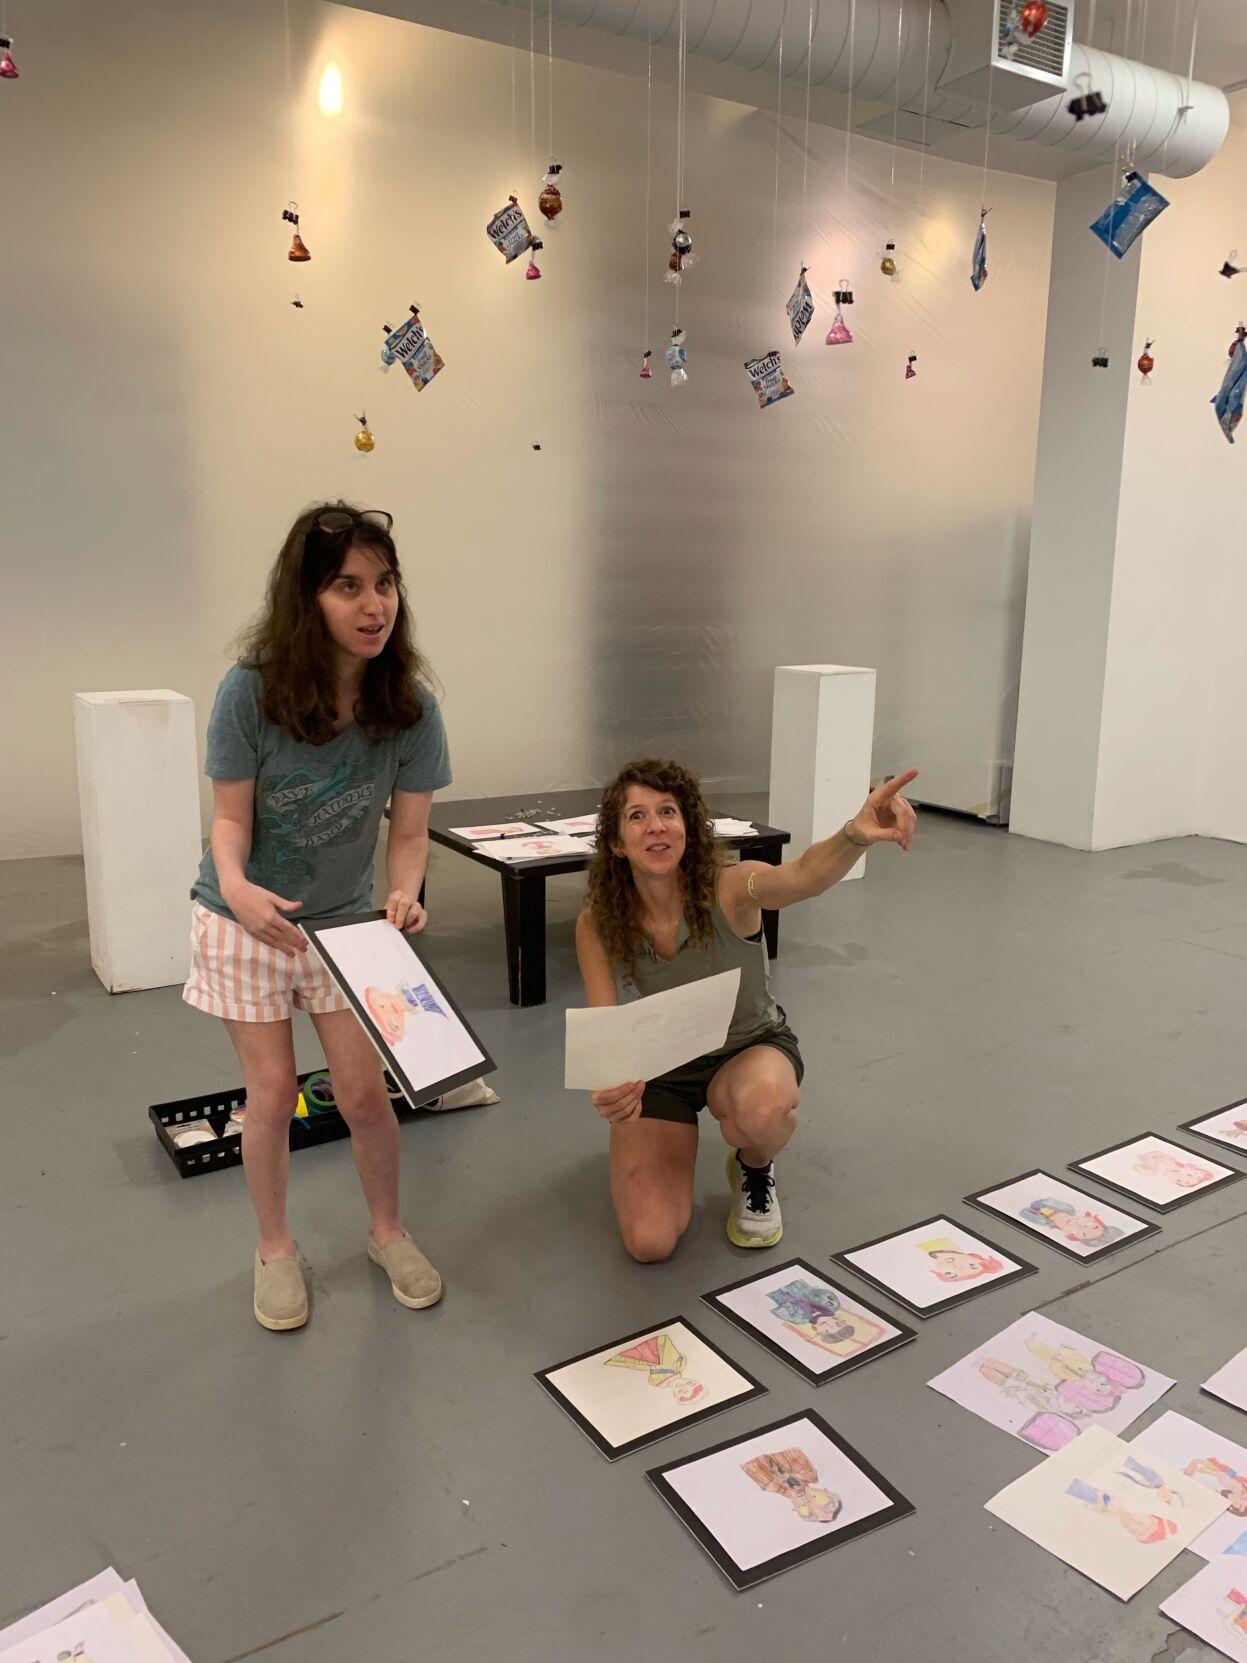 Sara Rekstis of Westerly has art show at Art Space Gallery